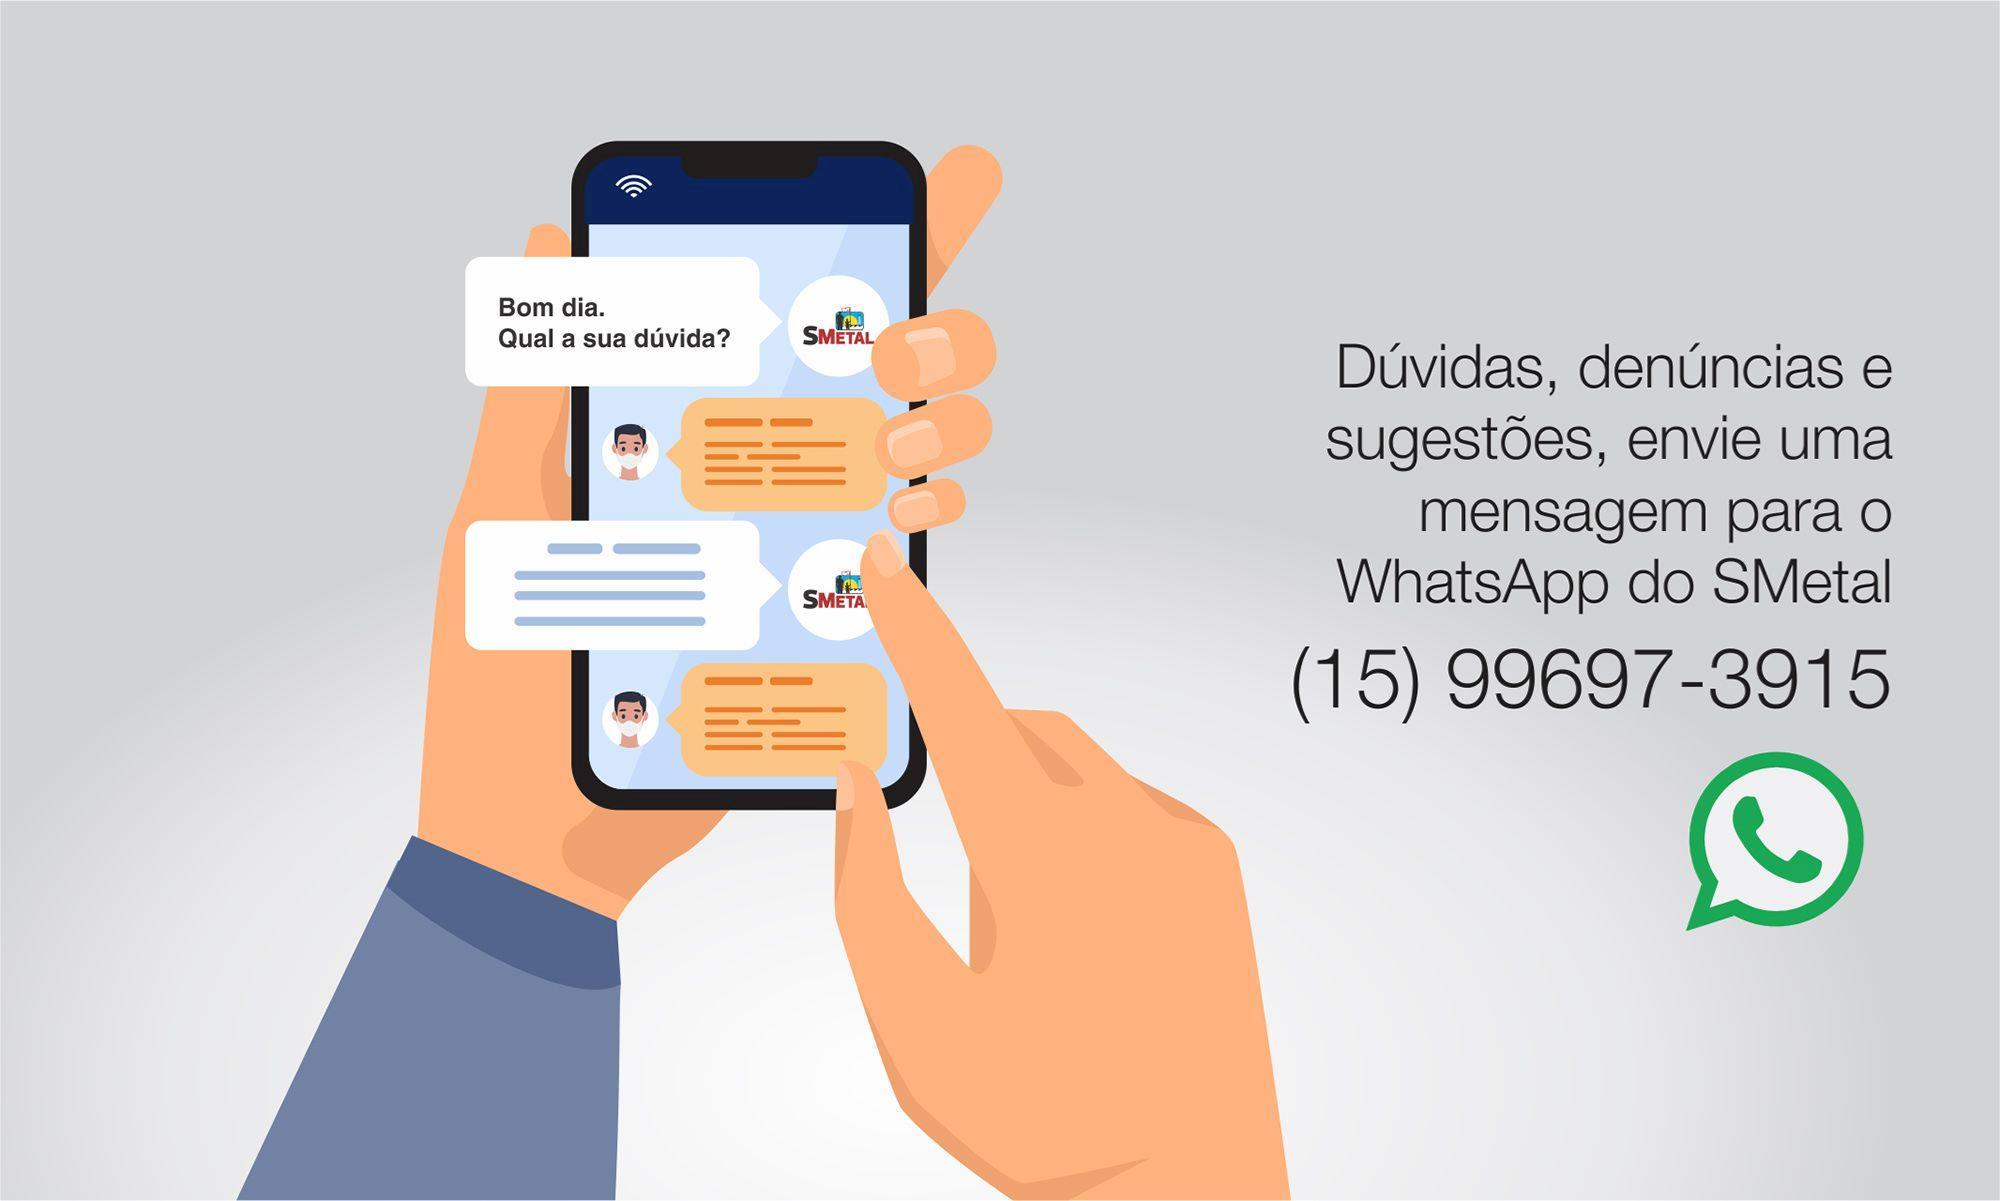 whatsapp, atendimento, sindicato, smetal, sorocaba, jurídico,, Foguinho/Arquivo Imprensa SMetal